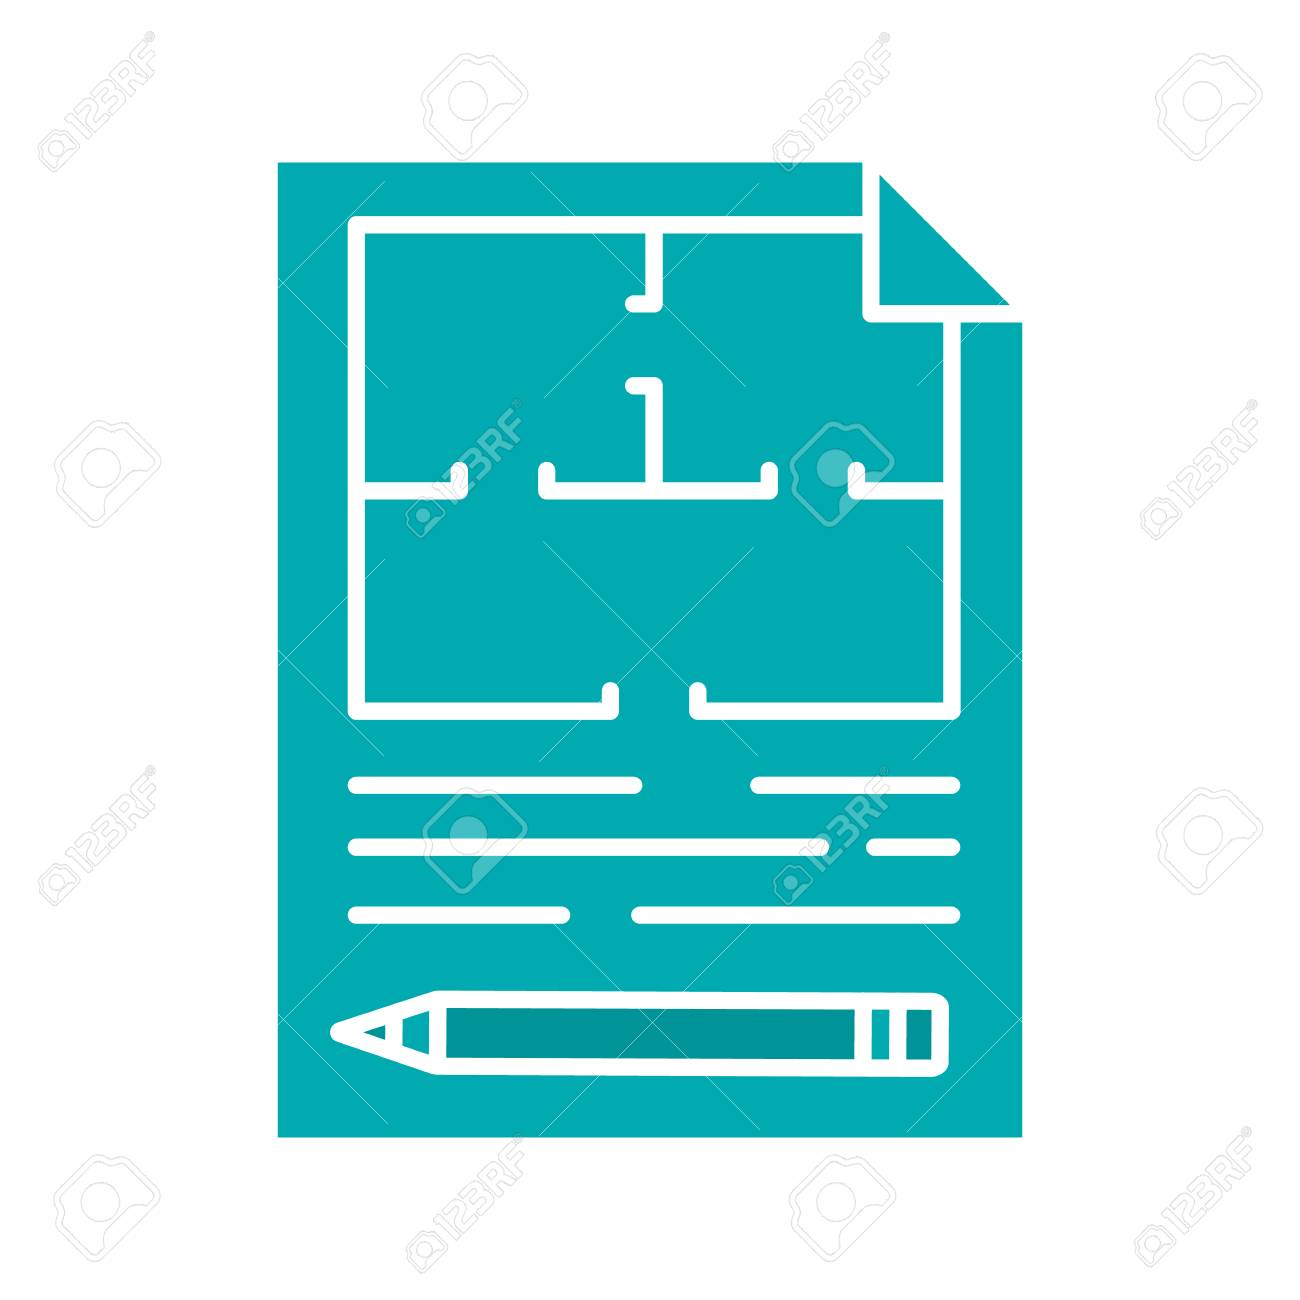 Free vector blueprint background clipart vector labs floor plan glyph color icon flat blueprint silhouette symbol rh 123rf com malvernweather Gallery